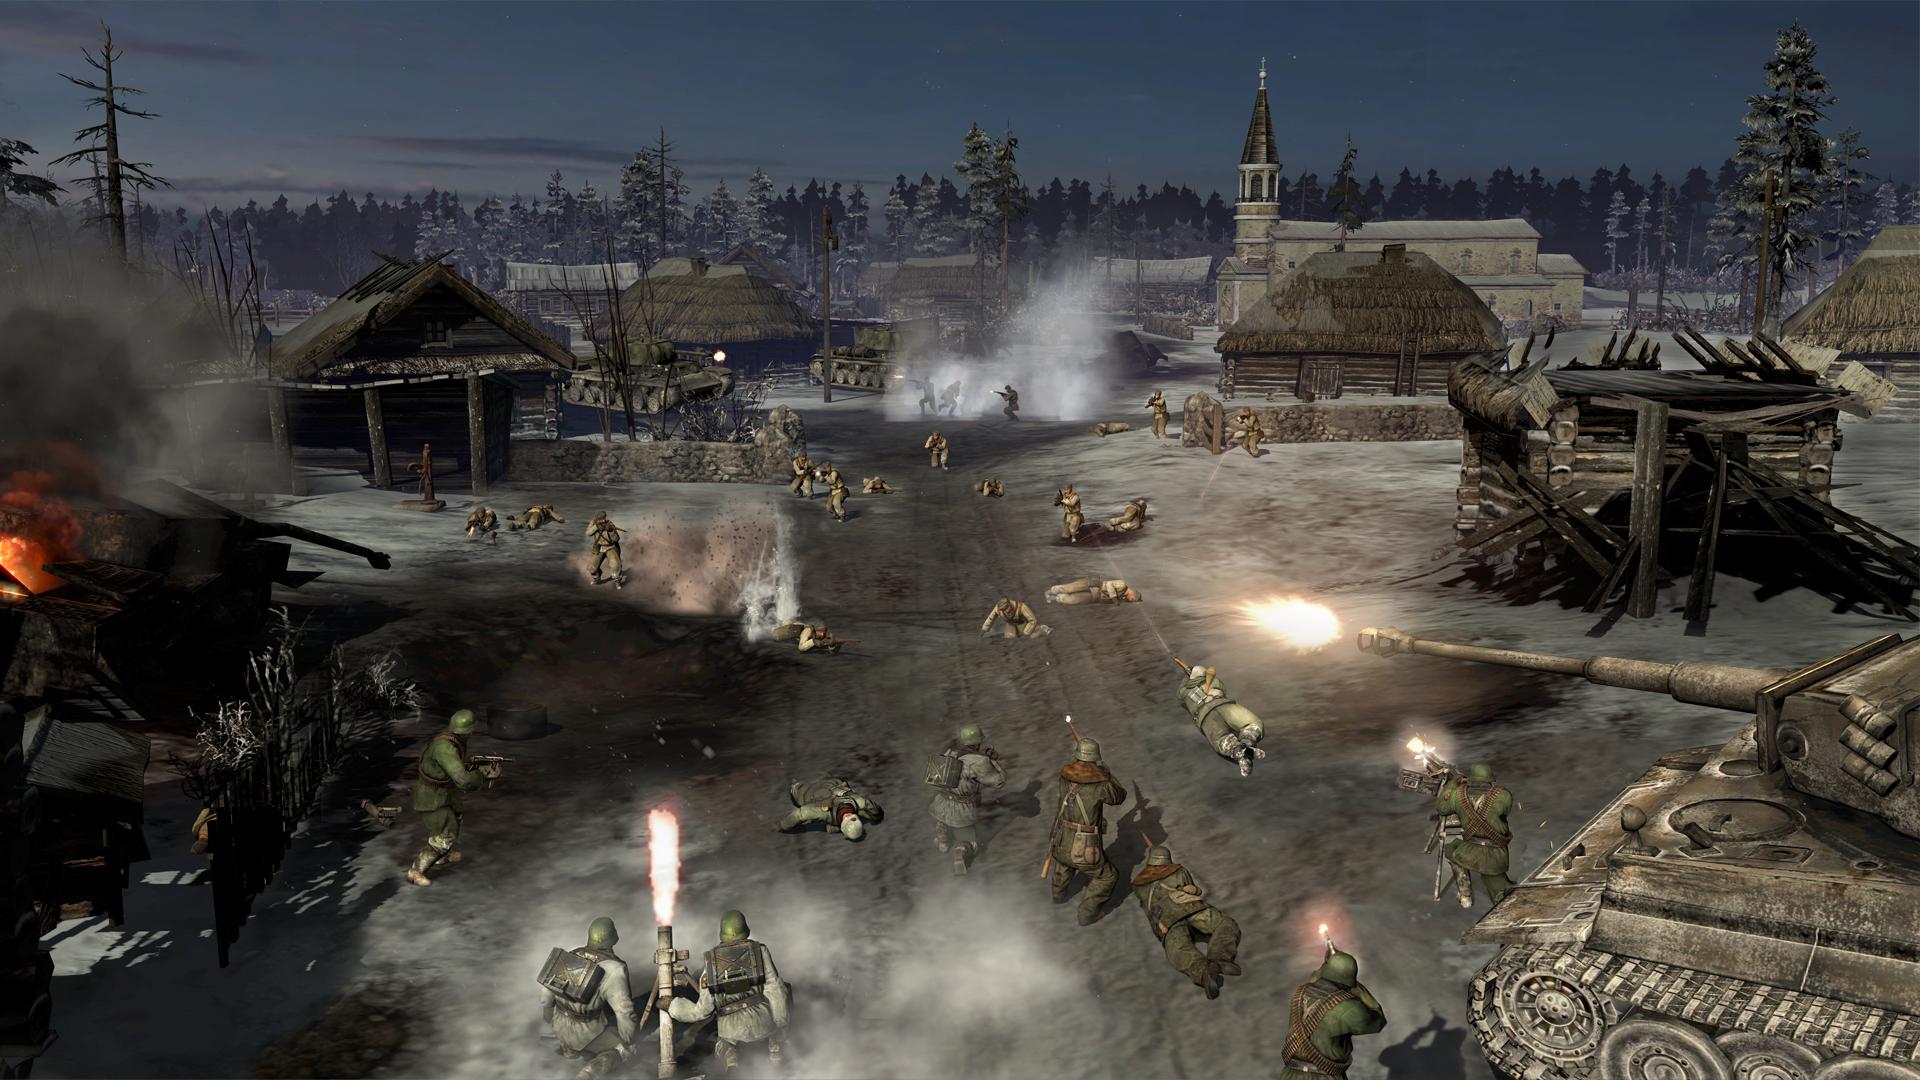 Gamescom obrázky z Company of Heroes 2 69305